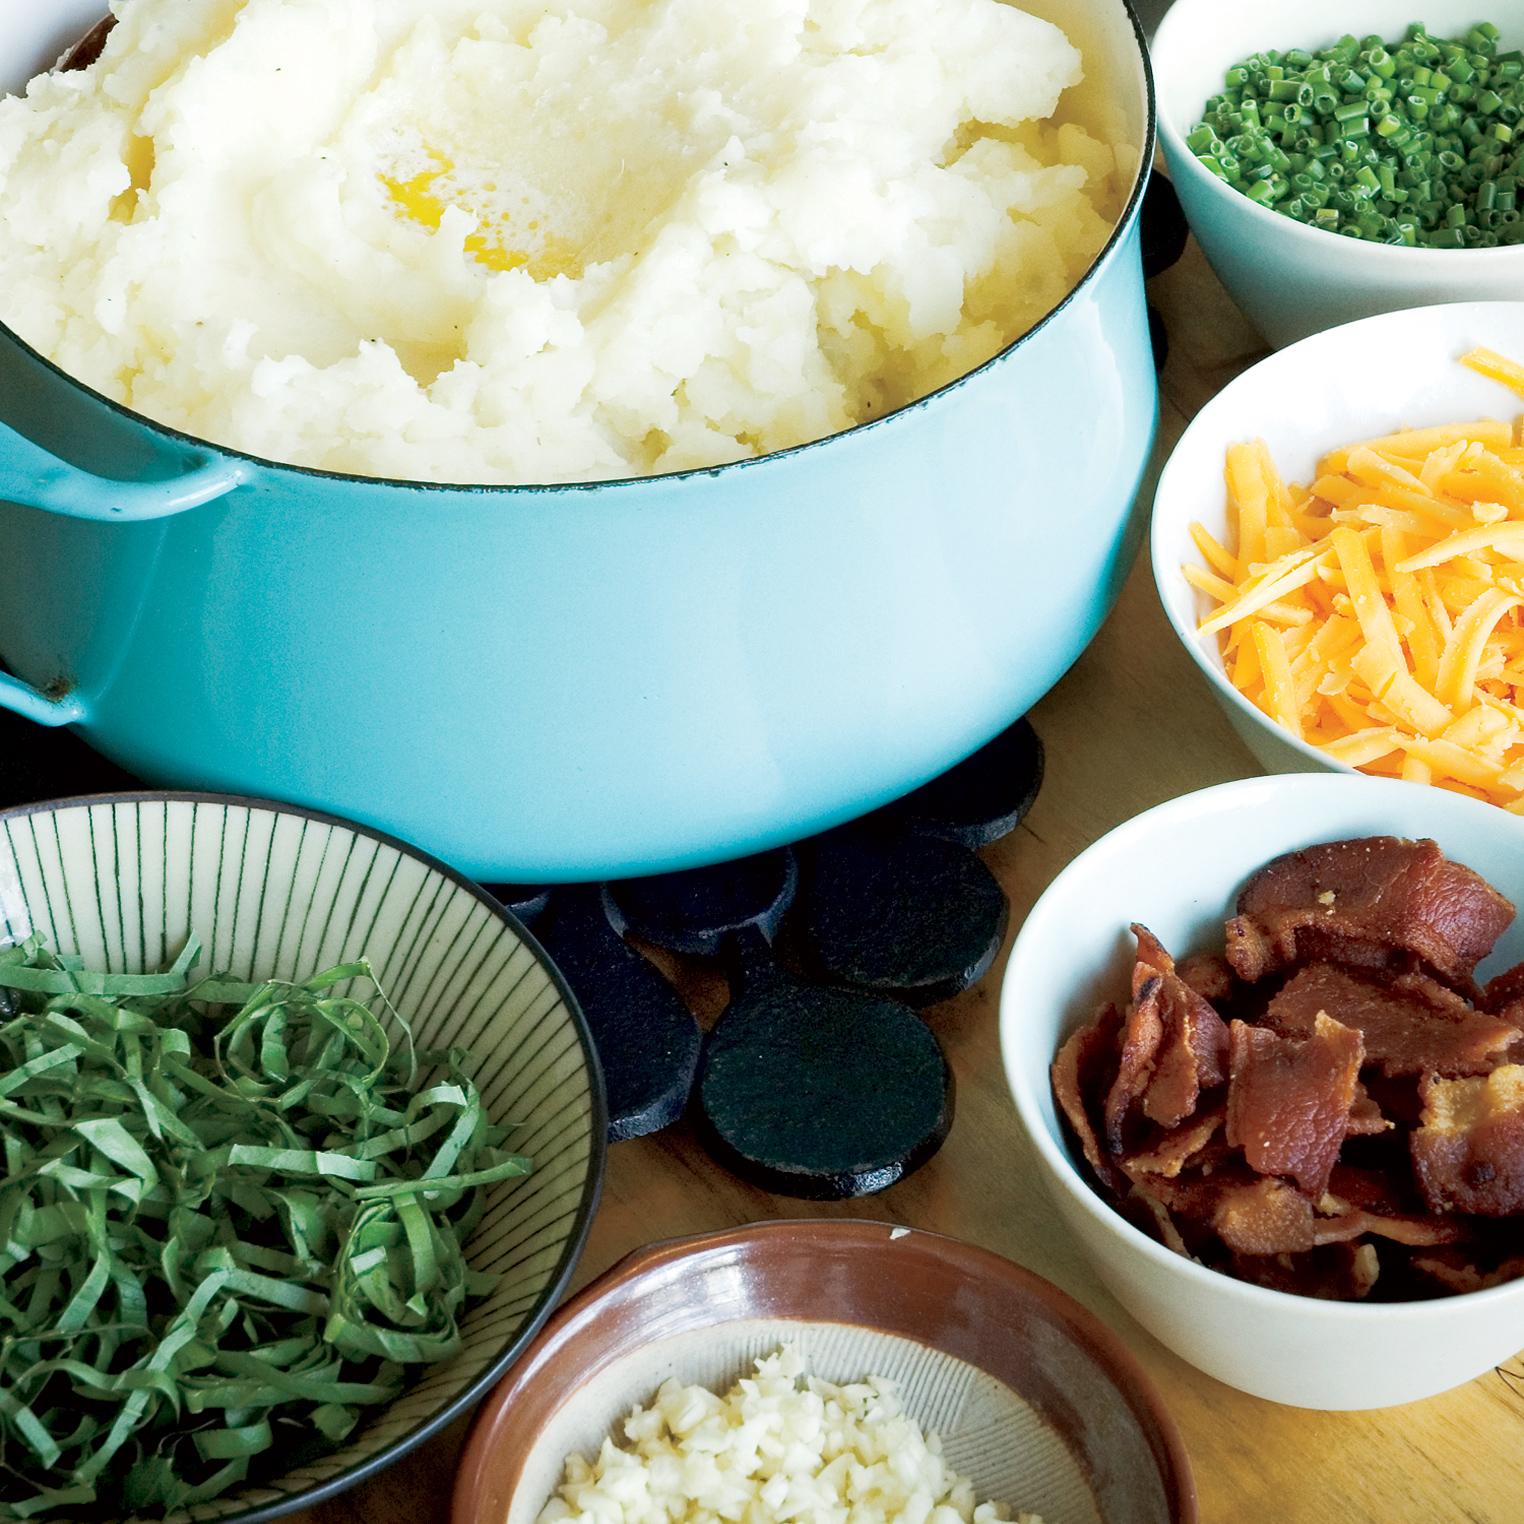 Potato Mash with Mix-Ins